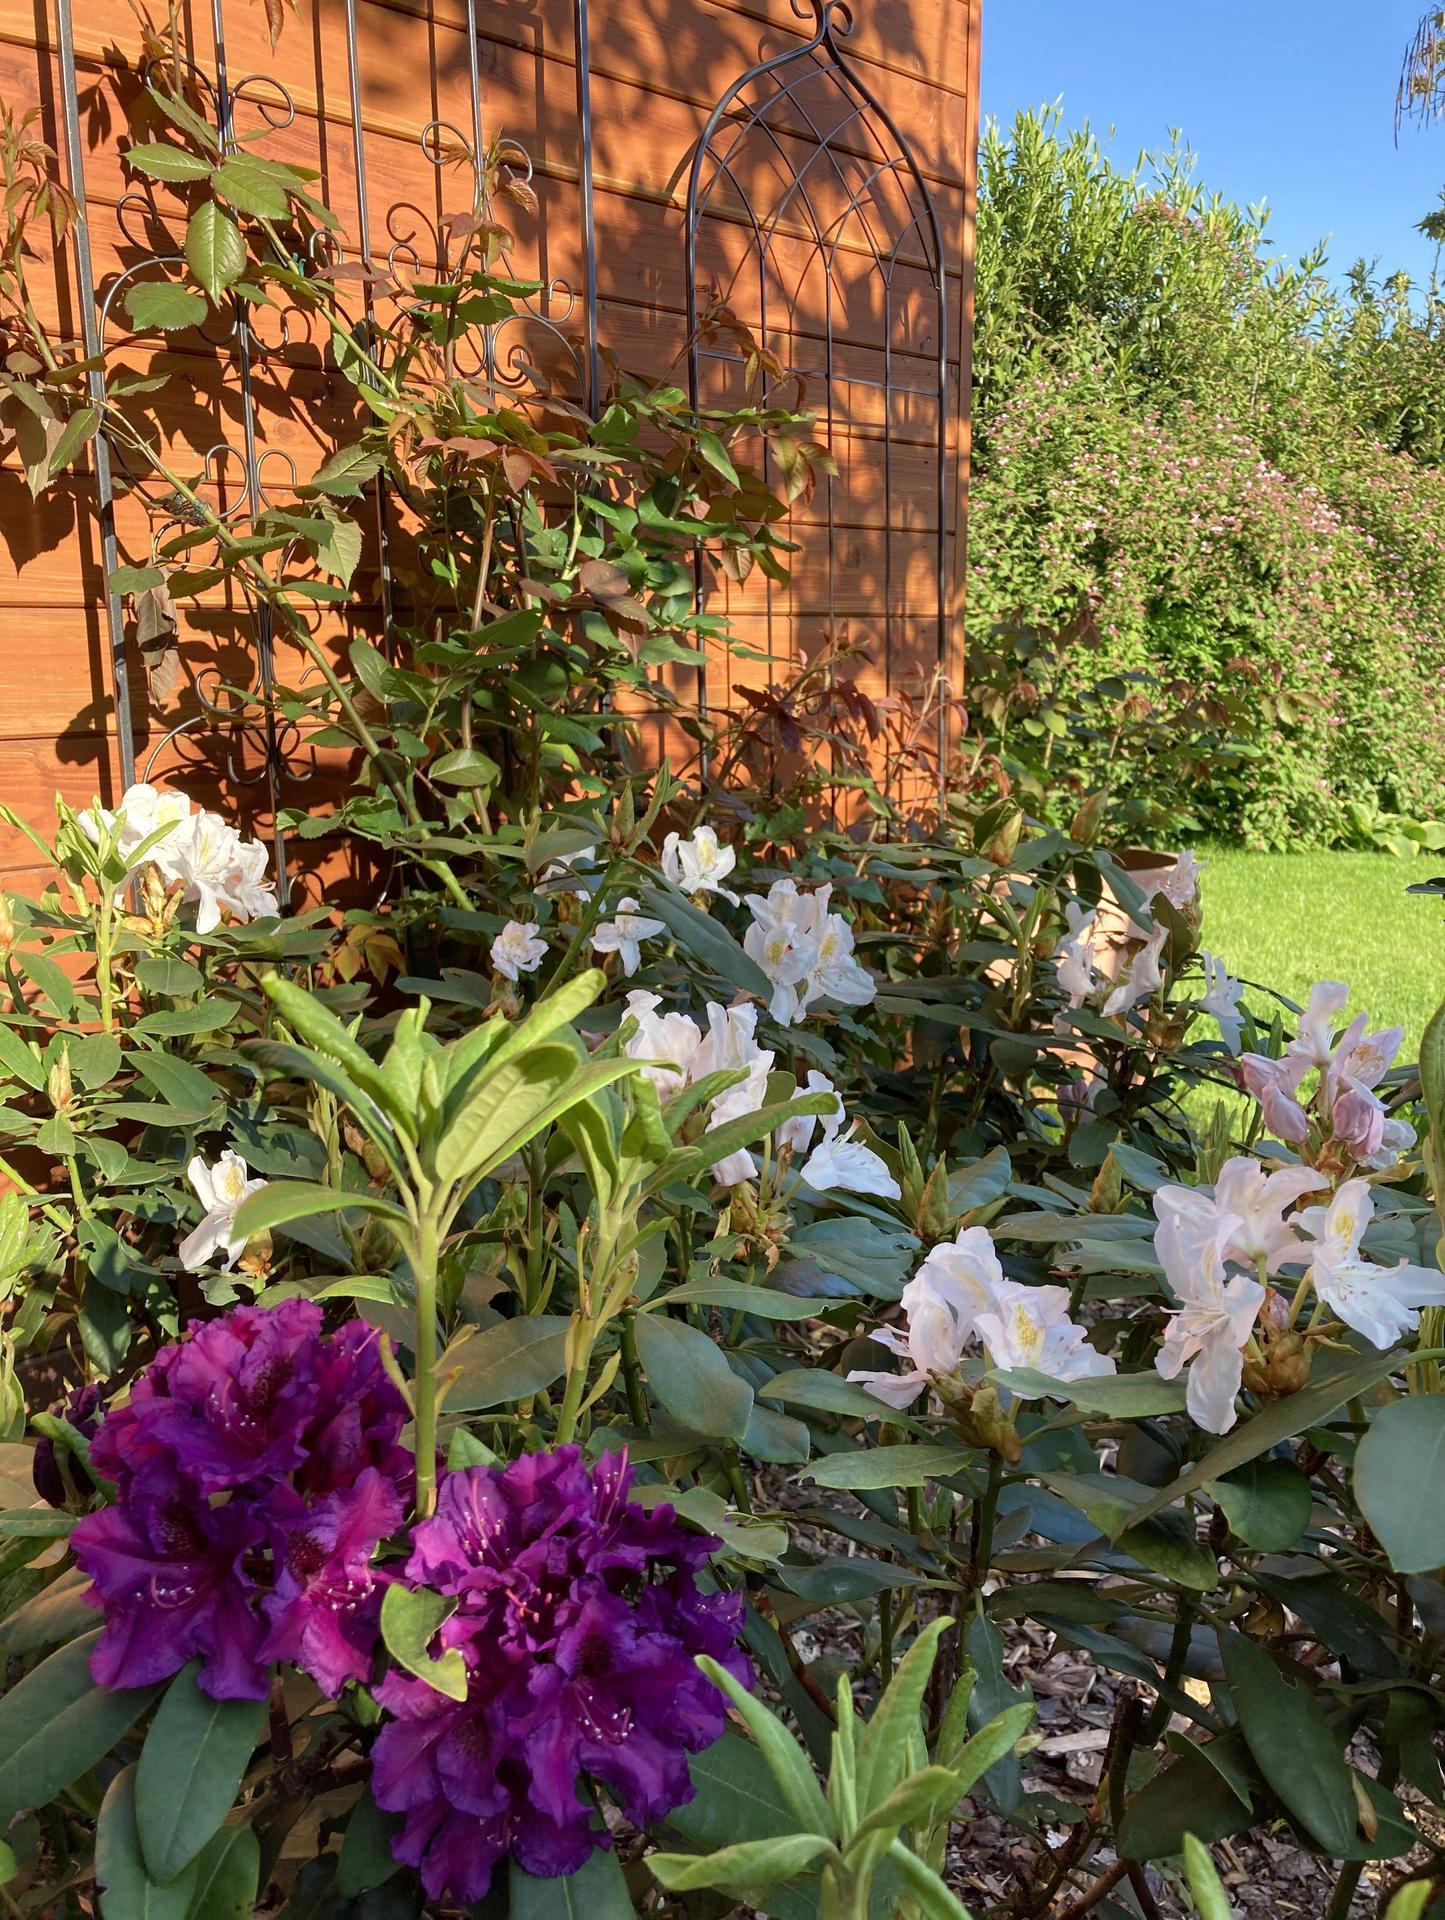 Zahrada 2021 - Popinave ruze se letos  cini- pote, co dostaly oporu....